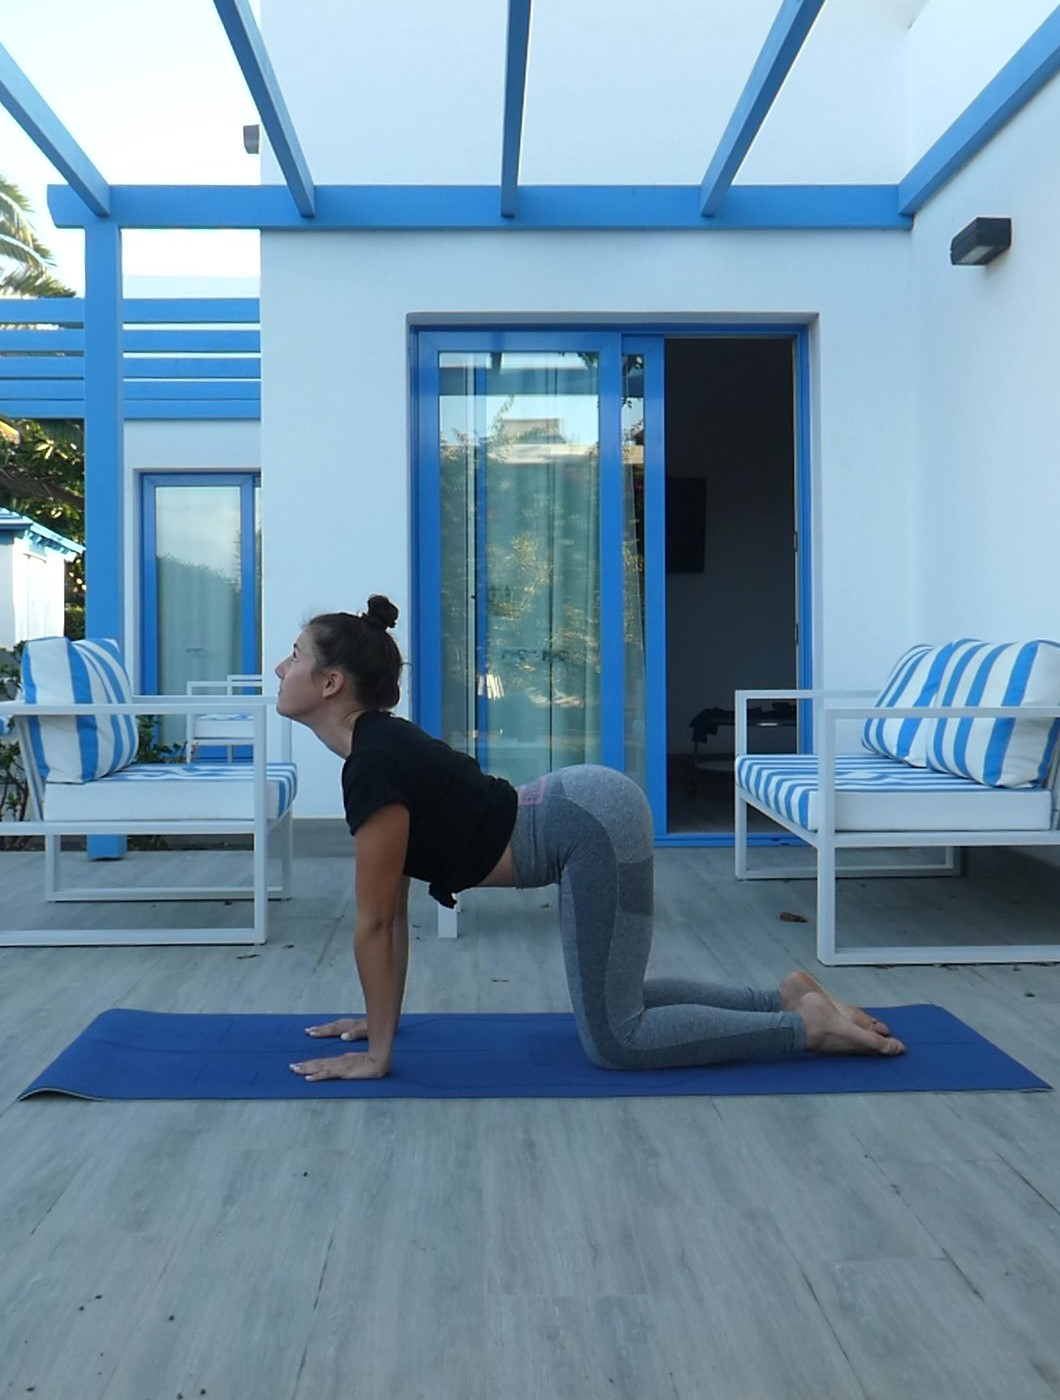 Posture chat dos creux, Marjaryasana, yoga